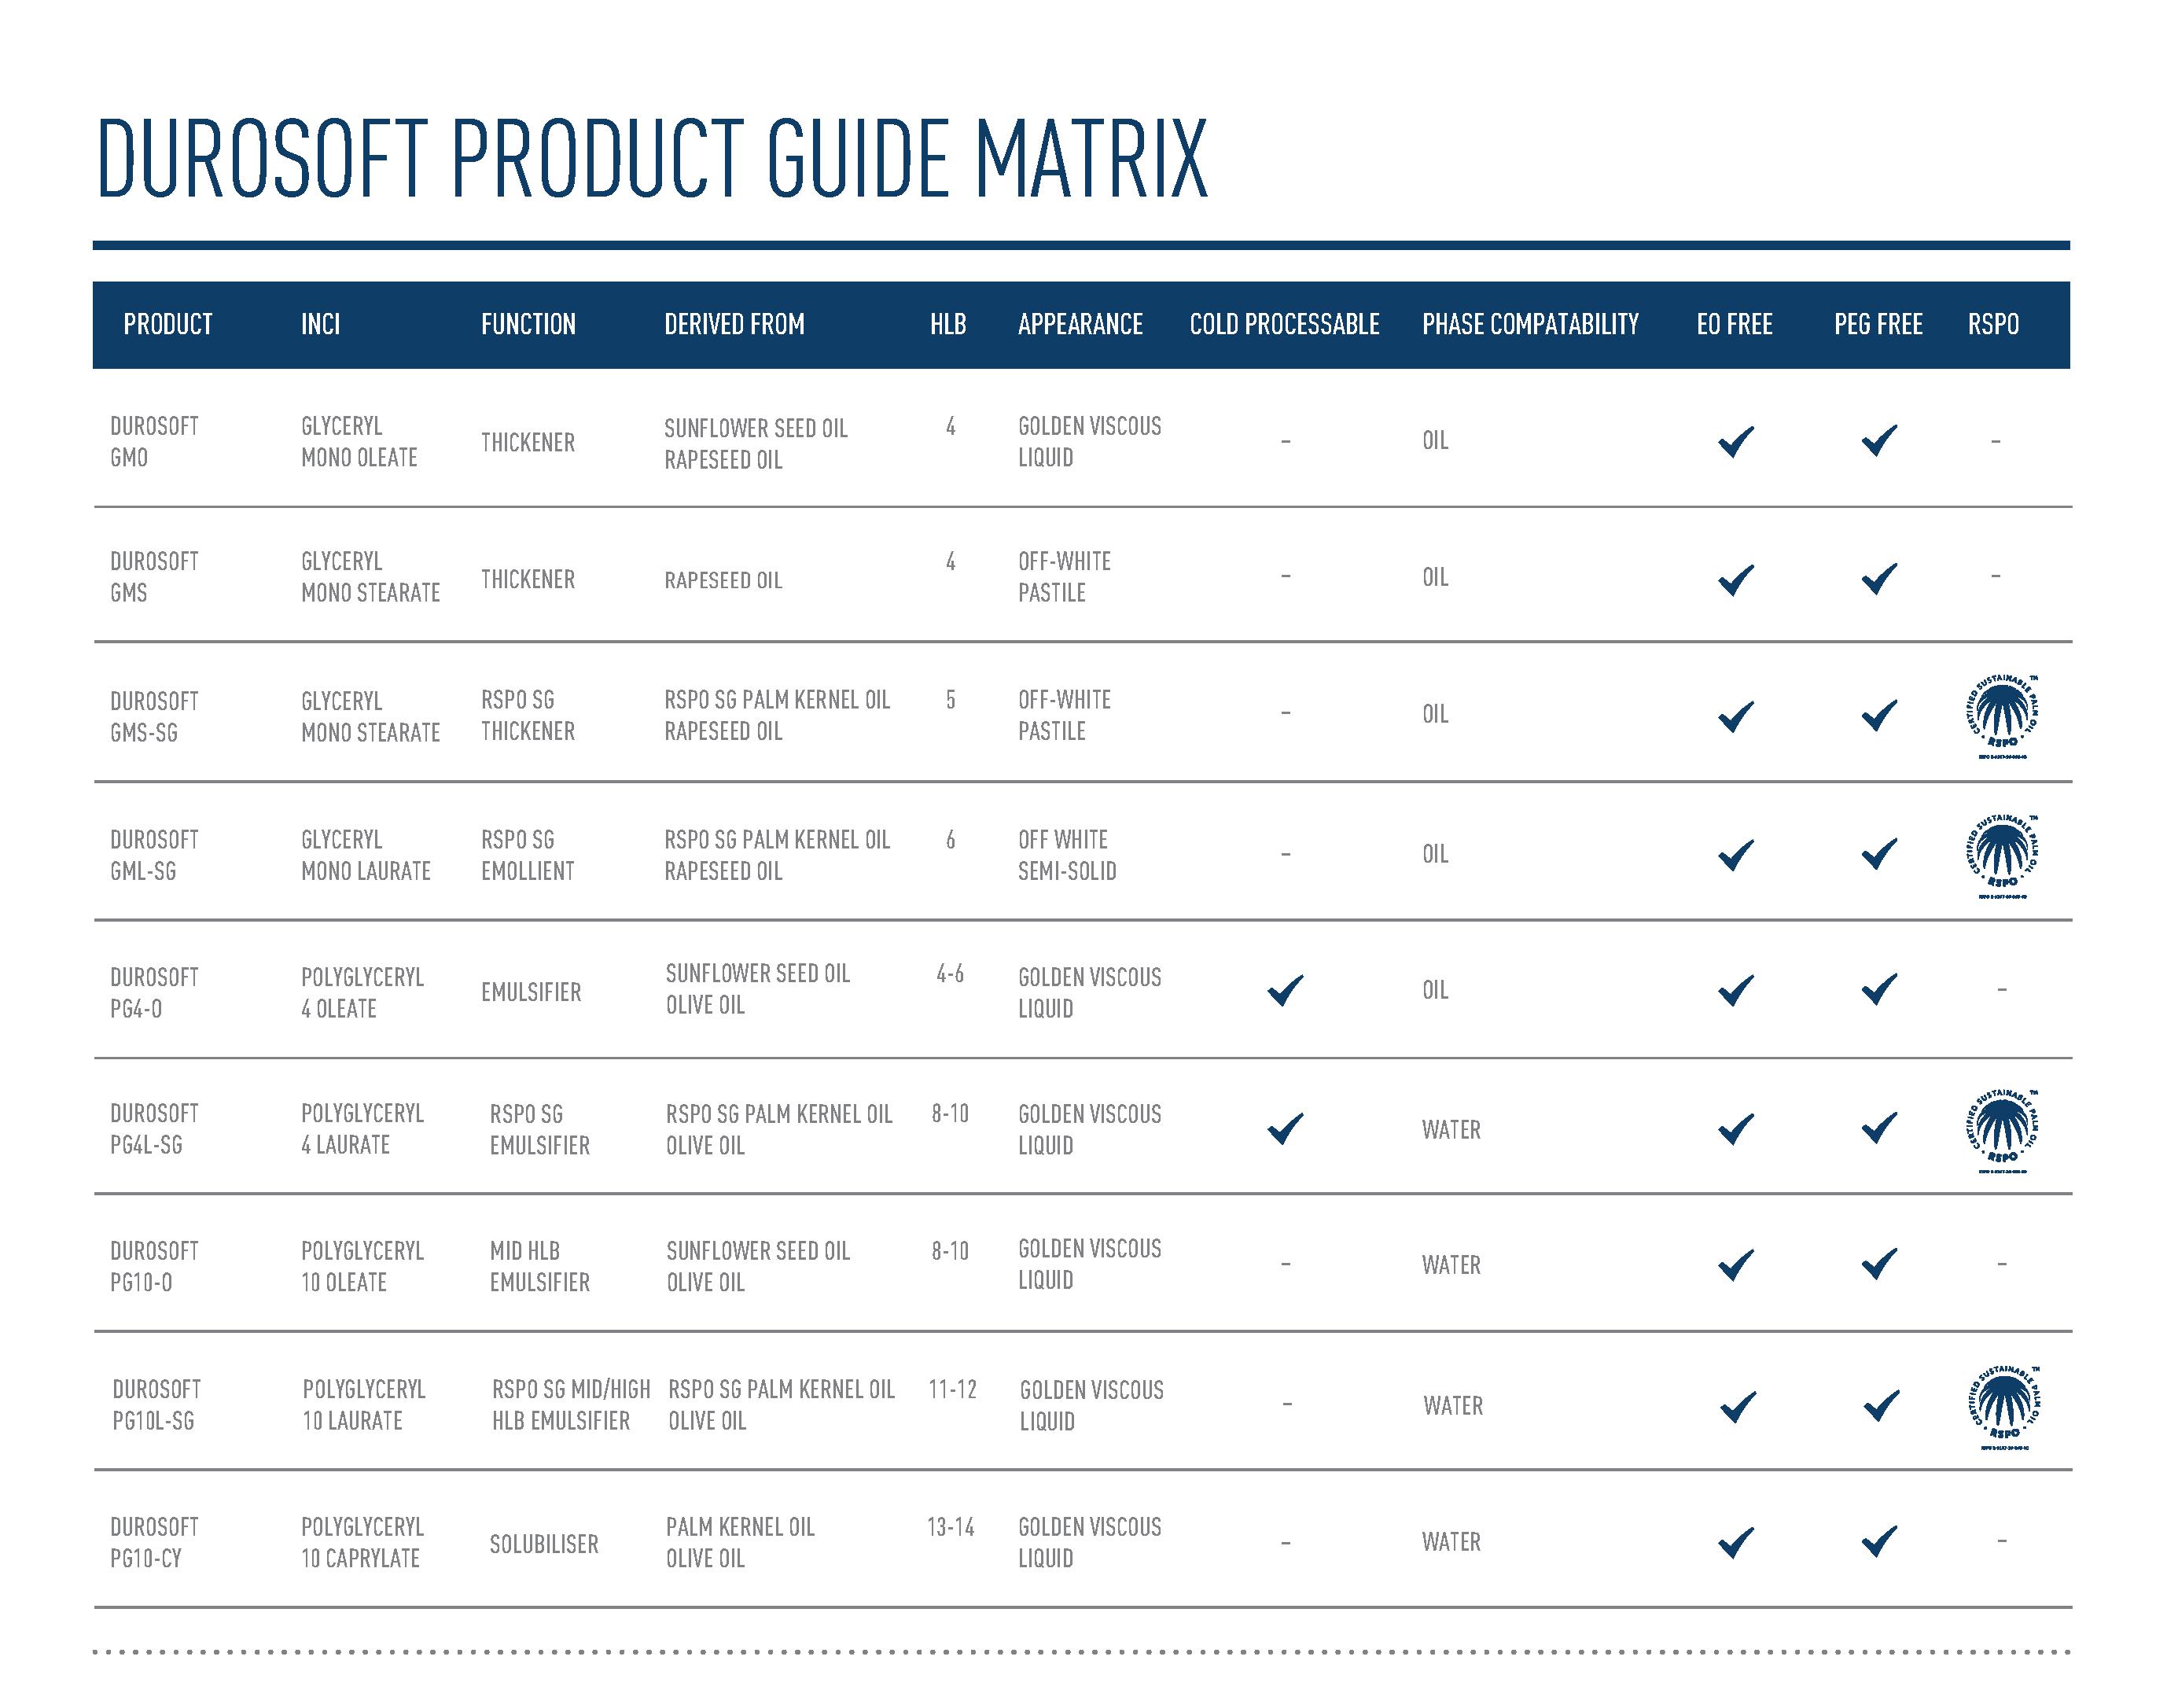 STEPHENSON-DUROSOFT Product Matrix